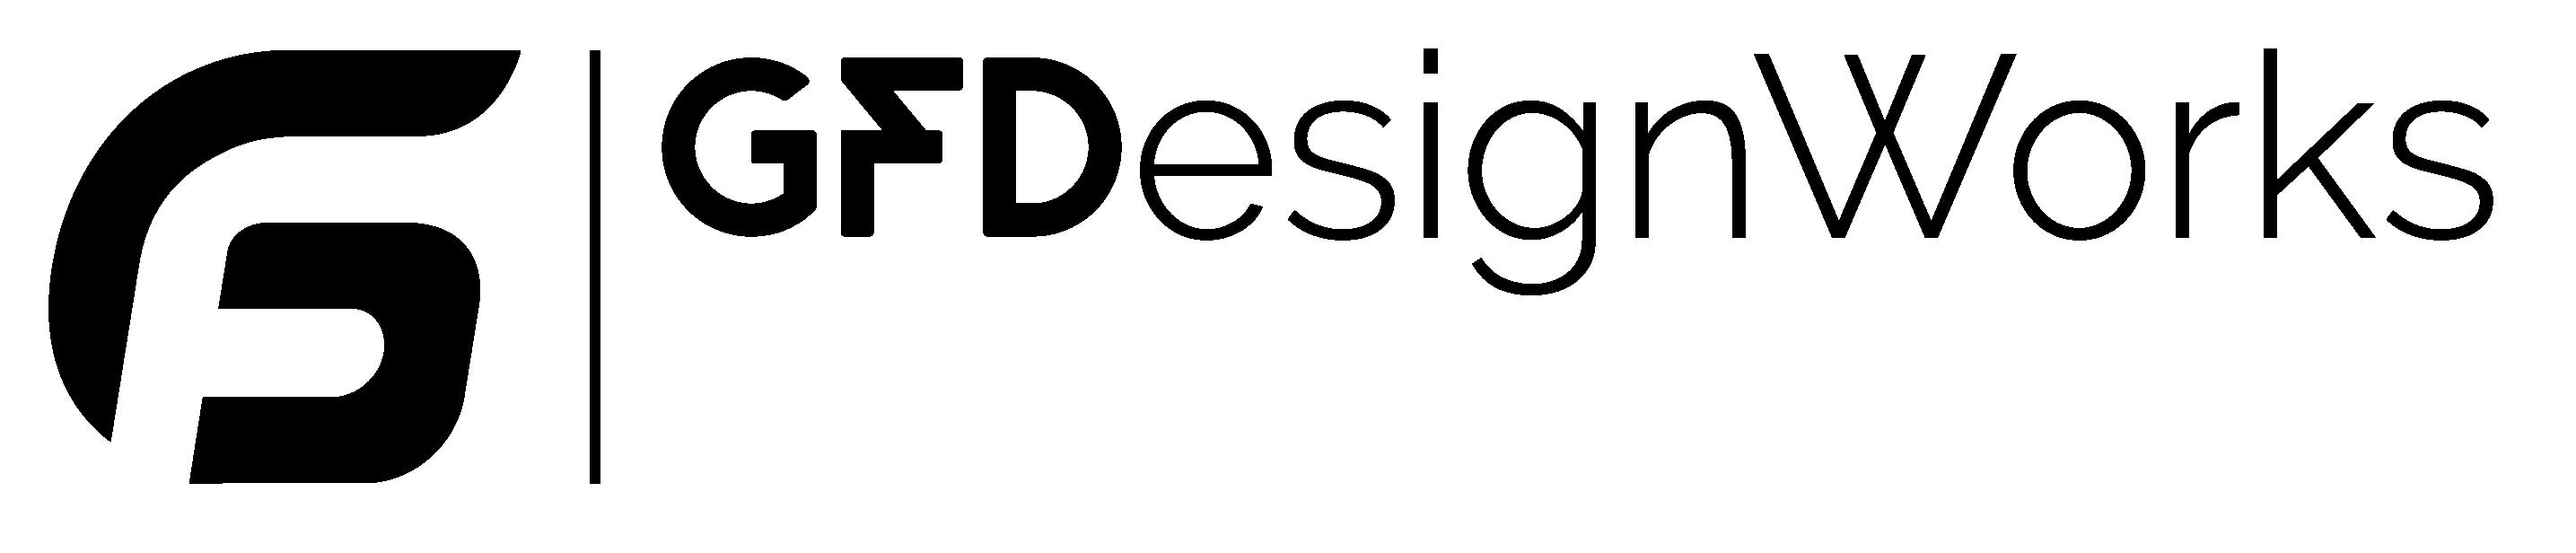 fucking round logo 5 20